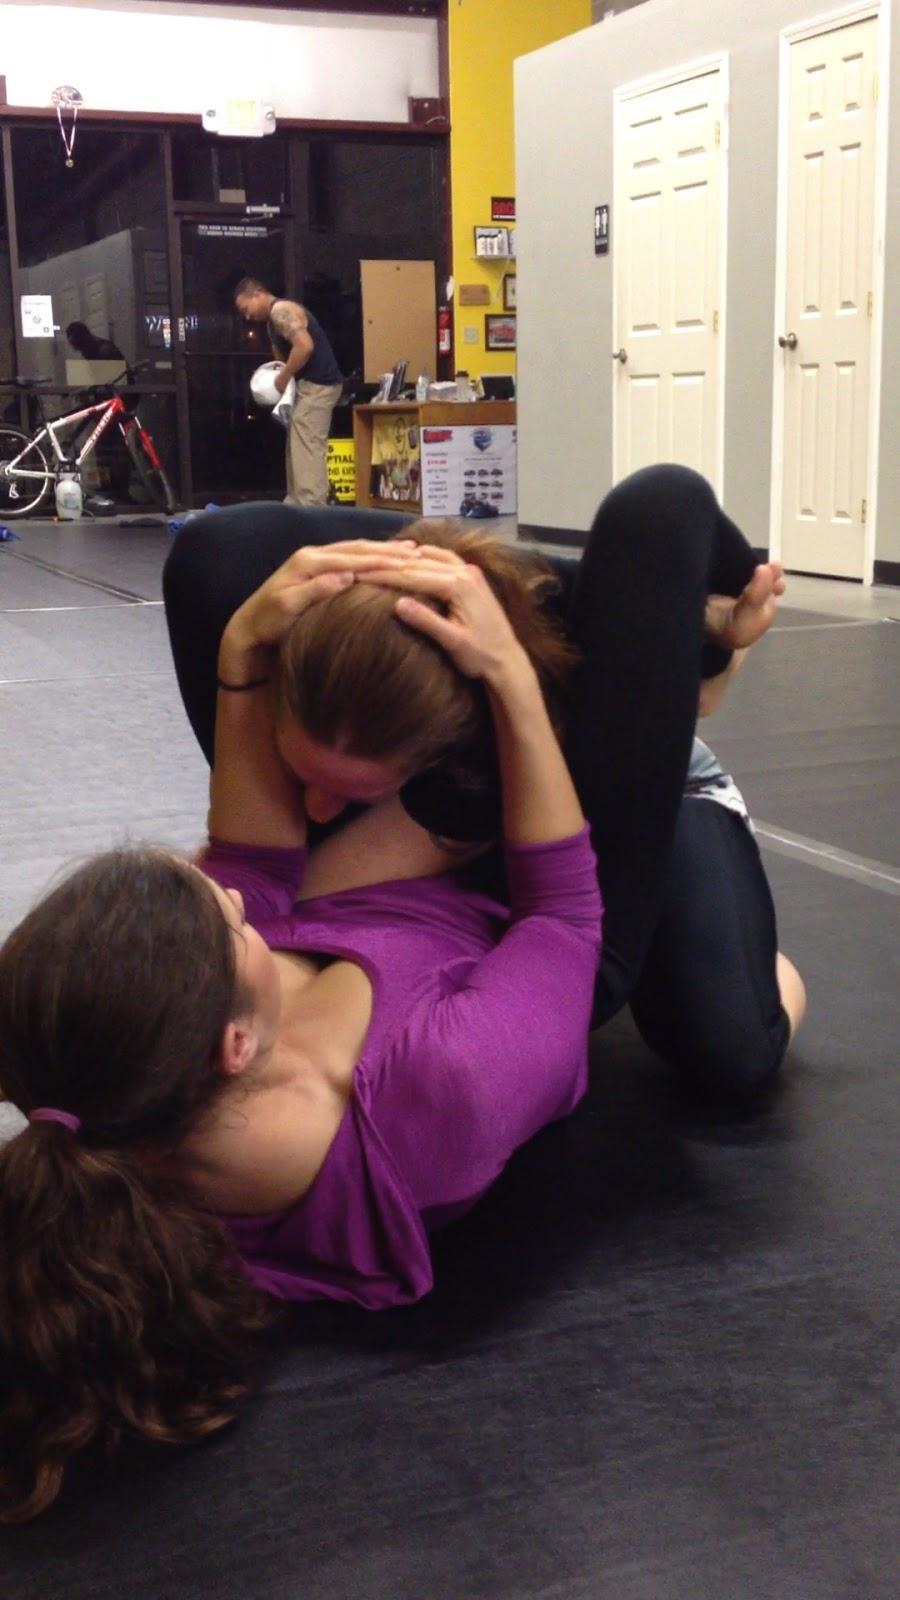 Girls Triangle Choke Submission Fox Fitness Brazilian Jiu